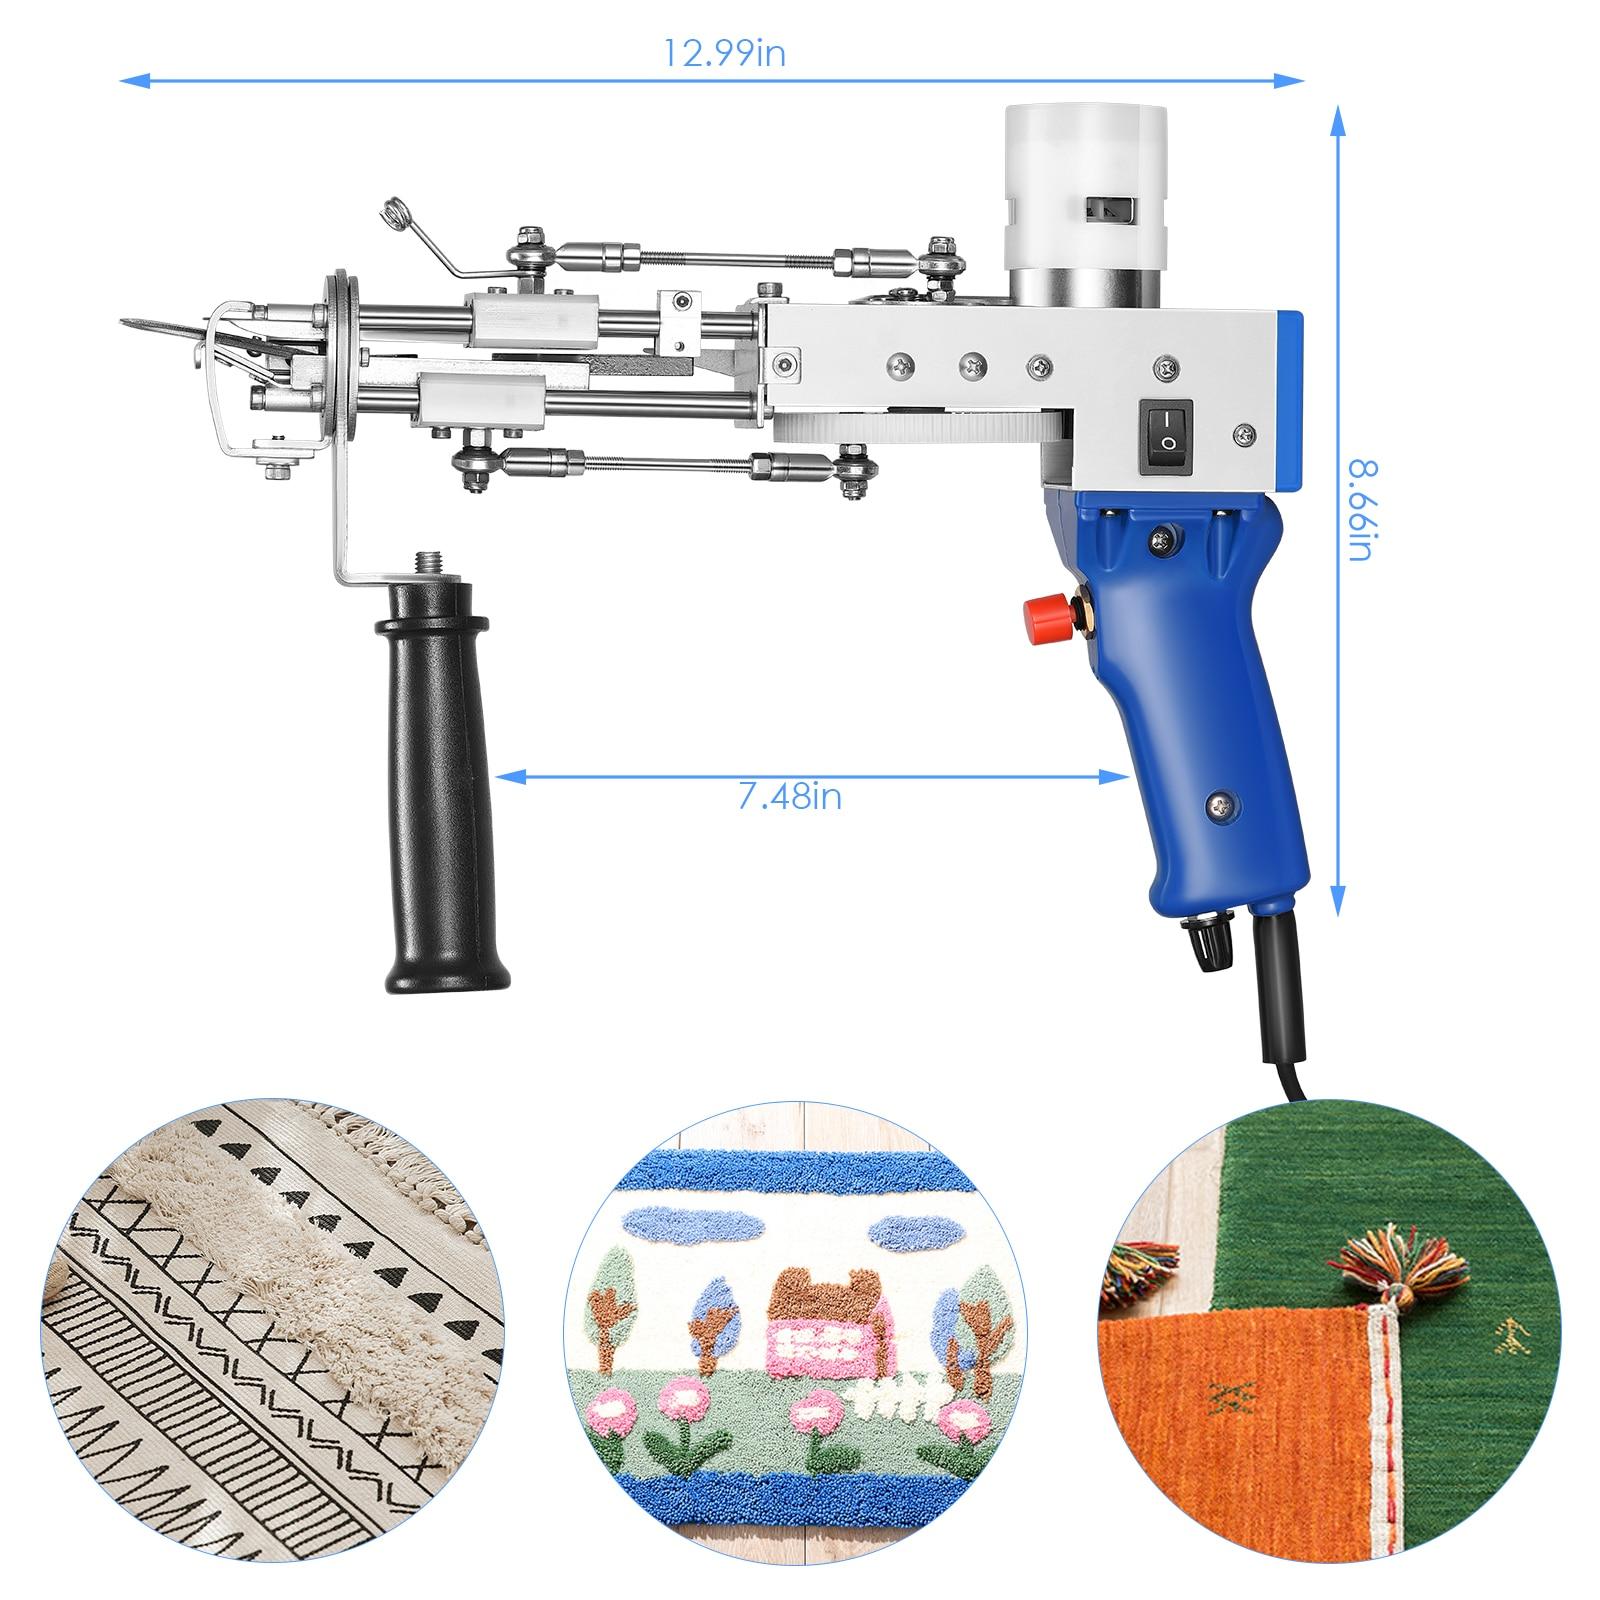 2021 New2 IN 1 Electric Carpet Tufting Gun Can Do Both Cut Pile and Loop Pile Hand Gun Carpet Weaving Flocking Machines EU/US/UK enlarge